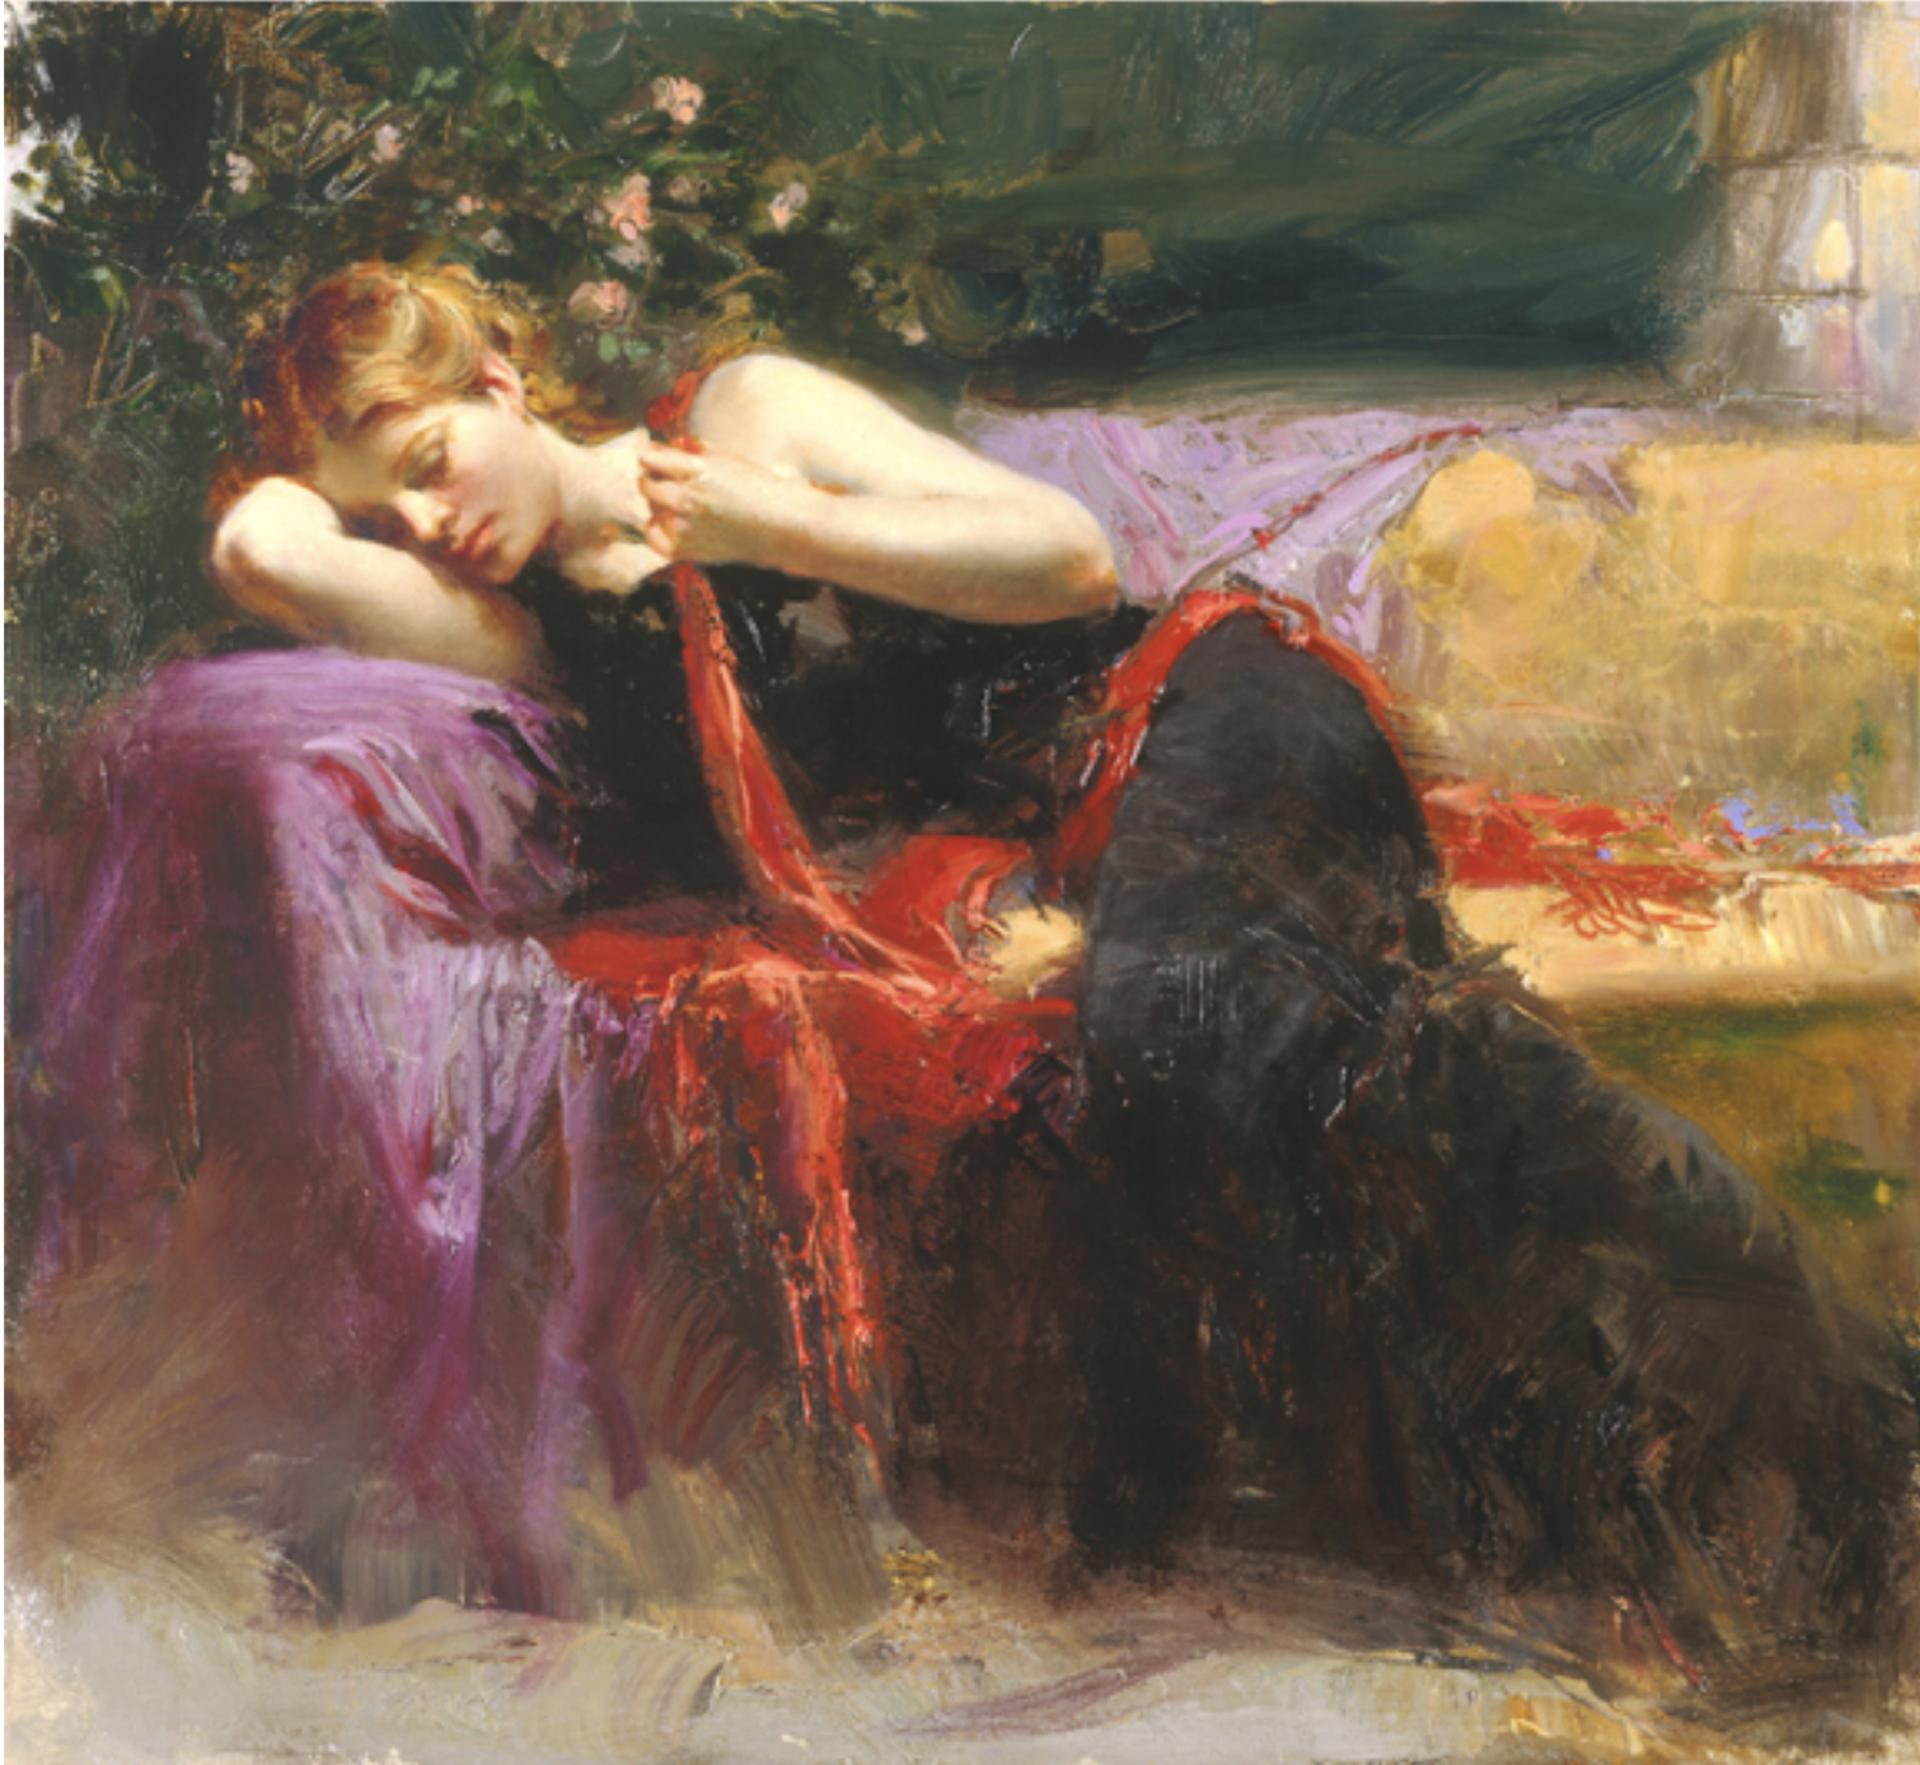 Sweet Dreams by Pino